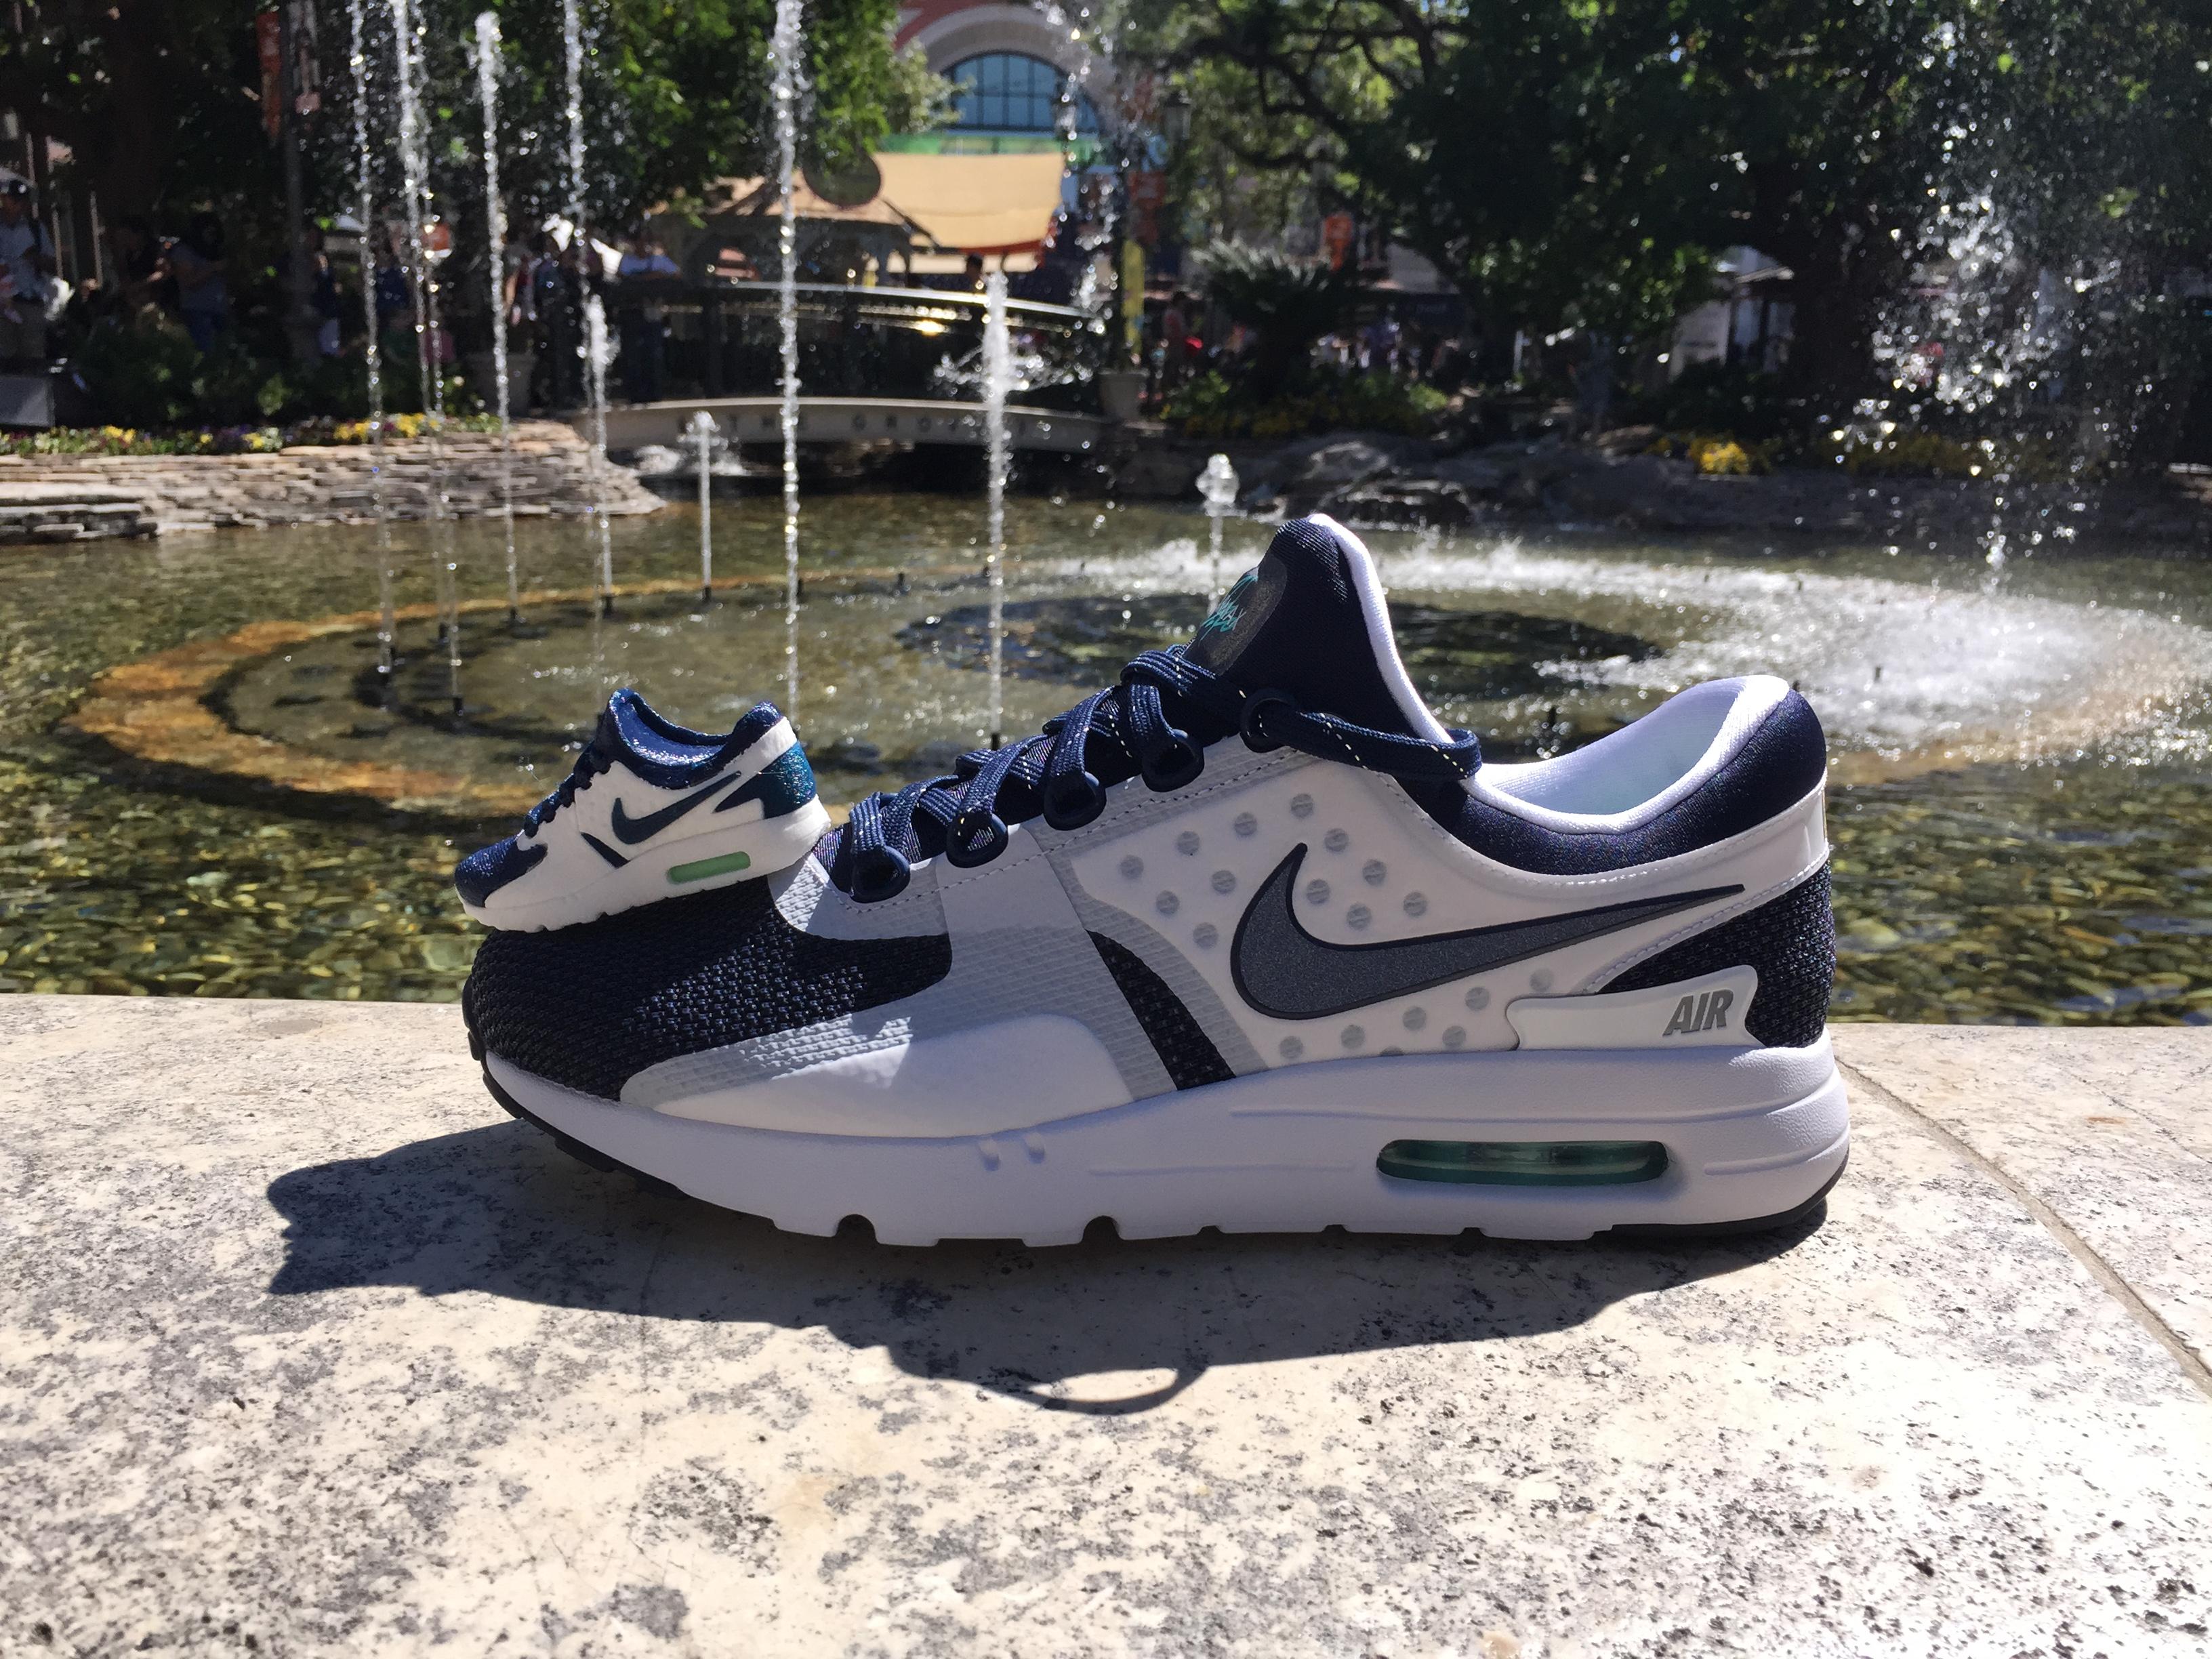 online store 66aa4 b7f98 KoF Mailbox SE: Nike Air Max Zero (Video) • KicksOnFire.com